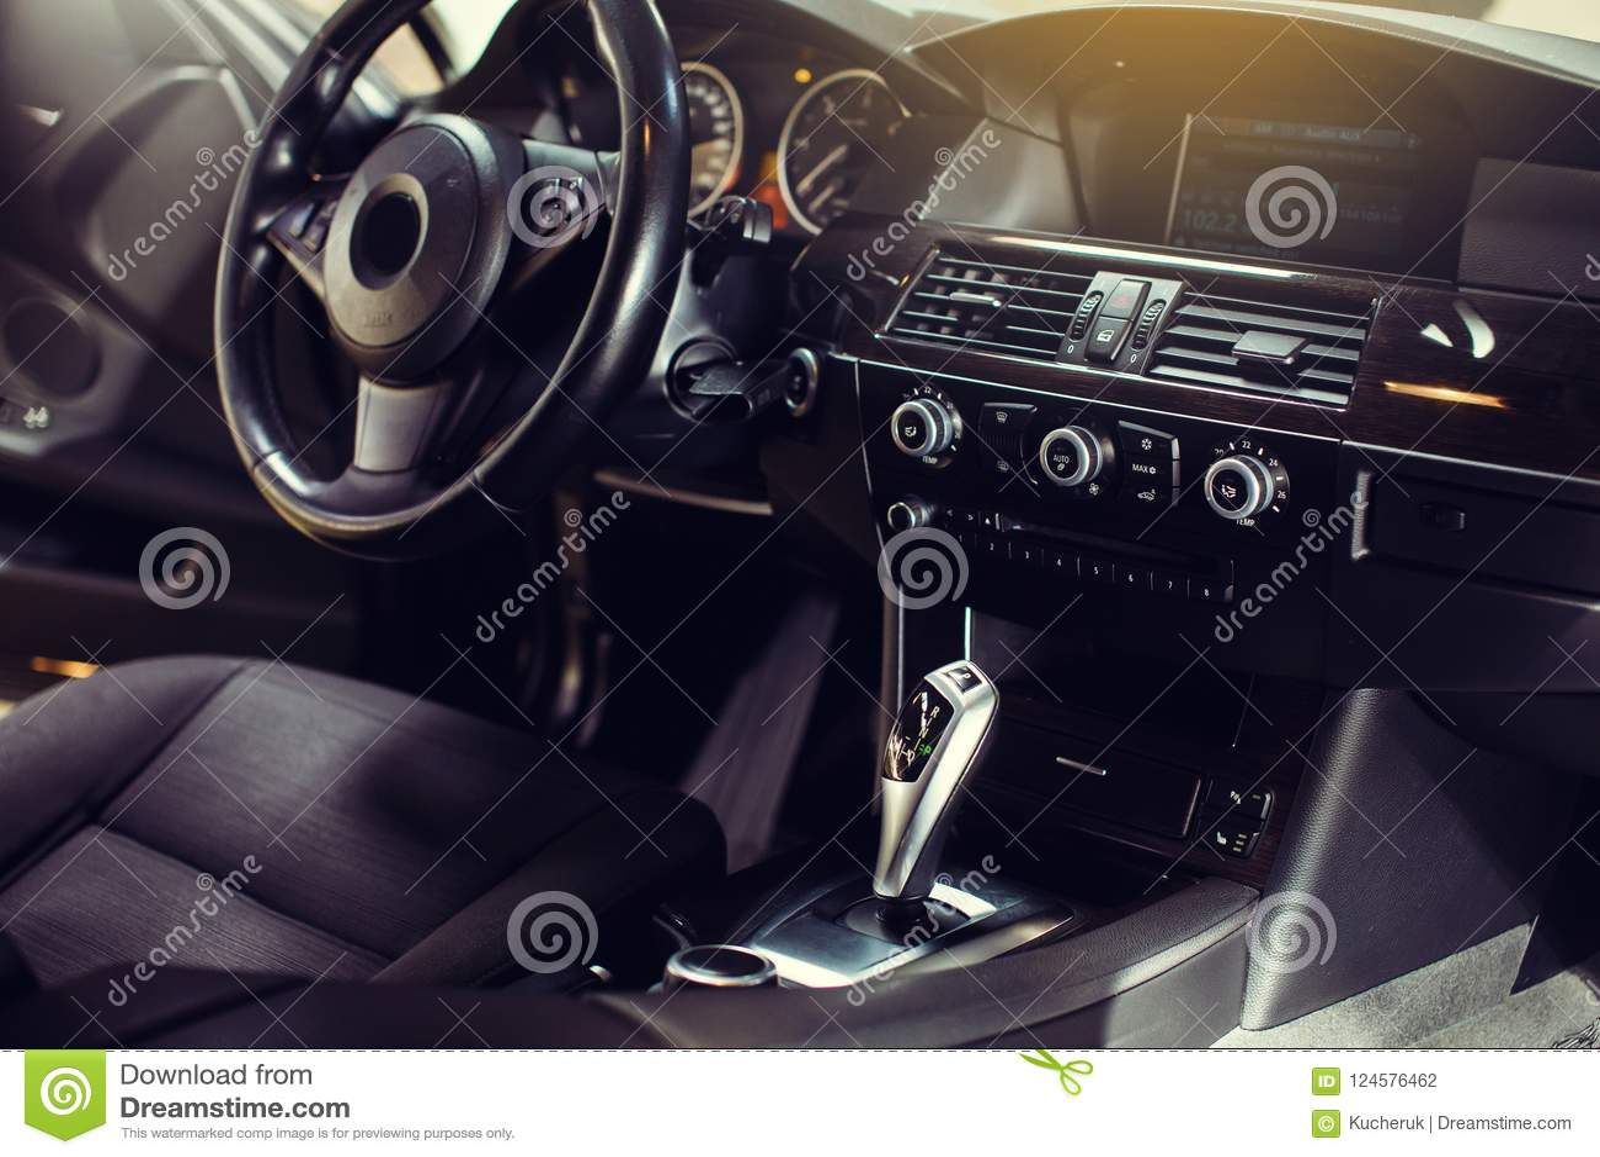 Modern luxury car Interior - steering wheel, shift lever and dashboard.